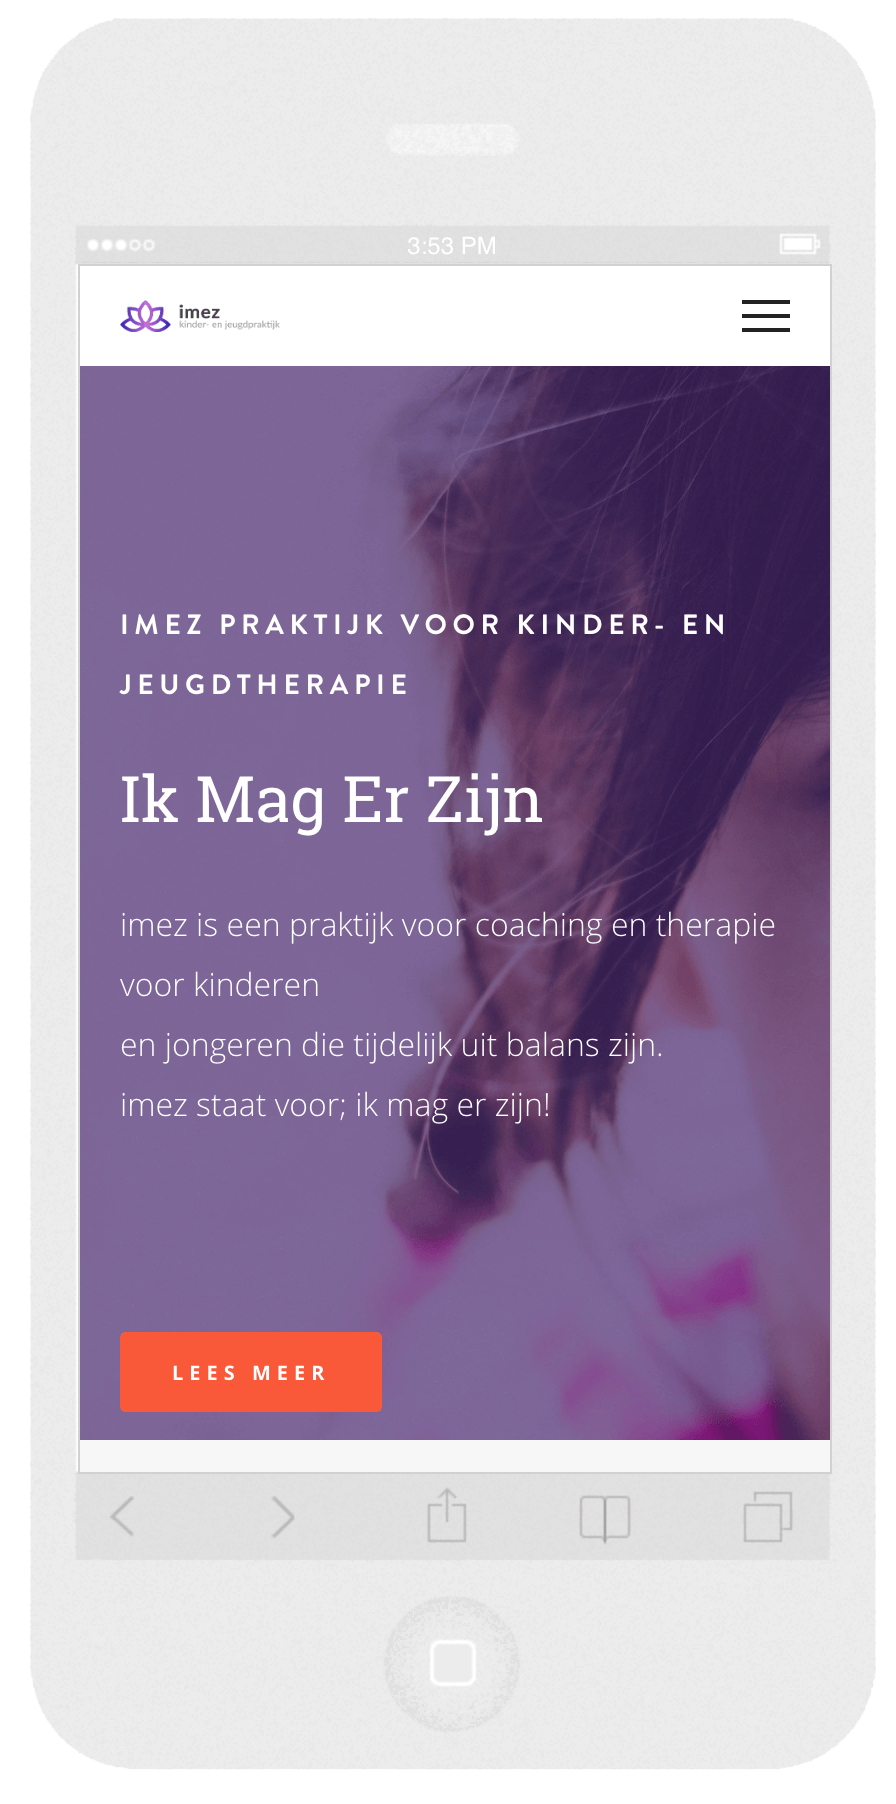 imez_website_iphone.png